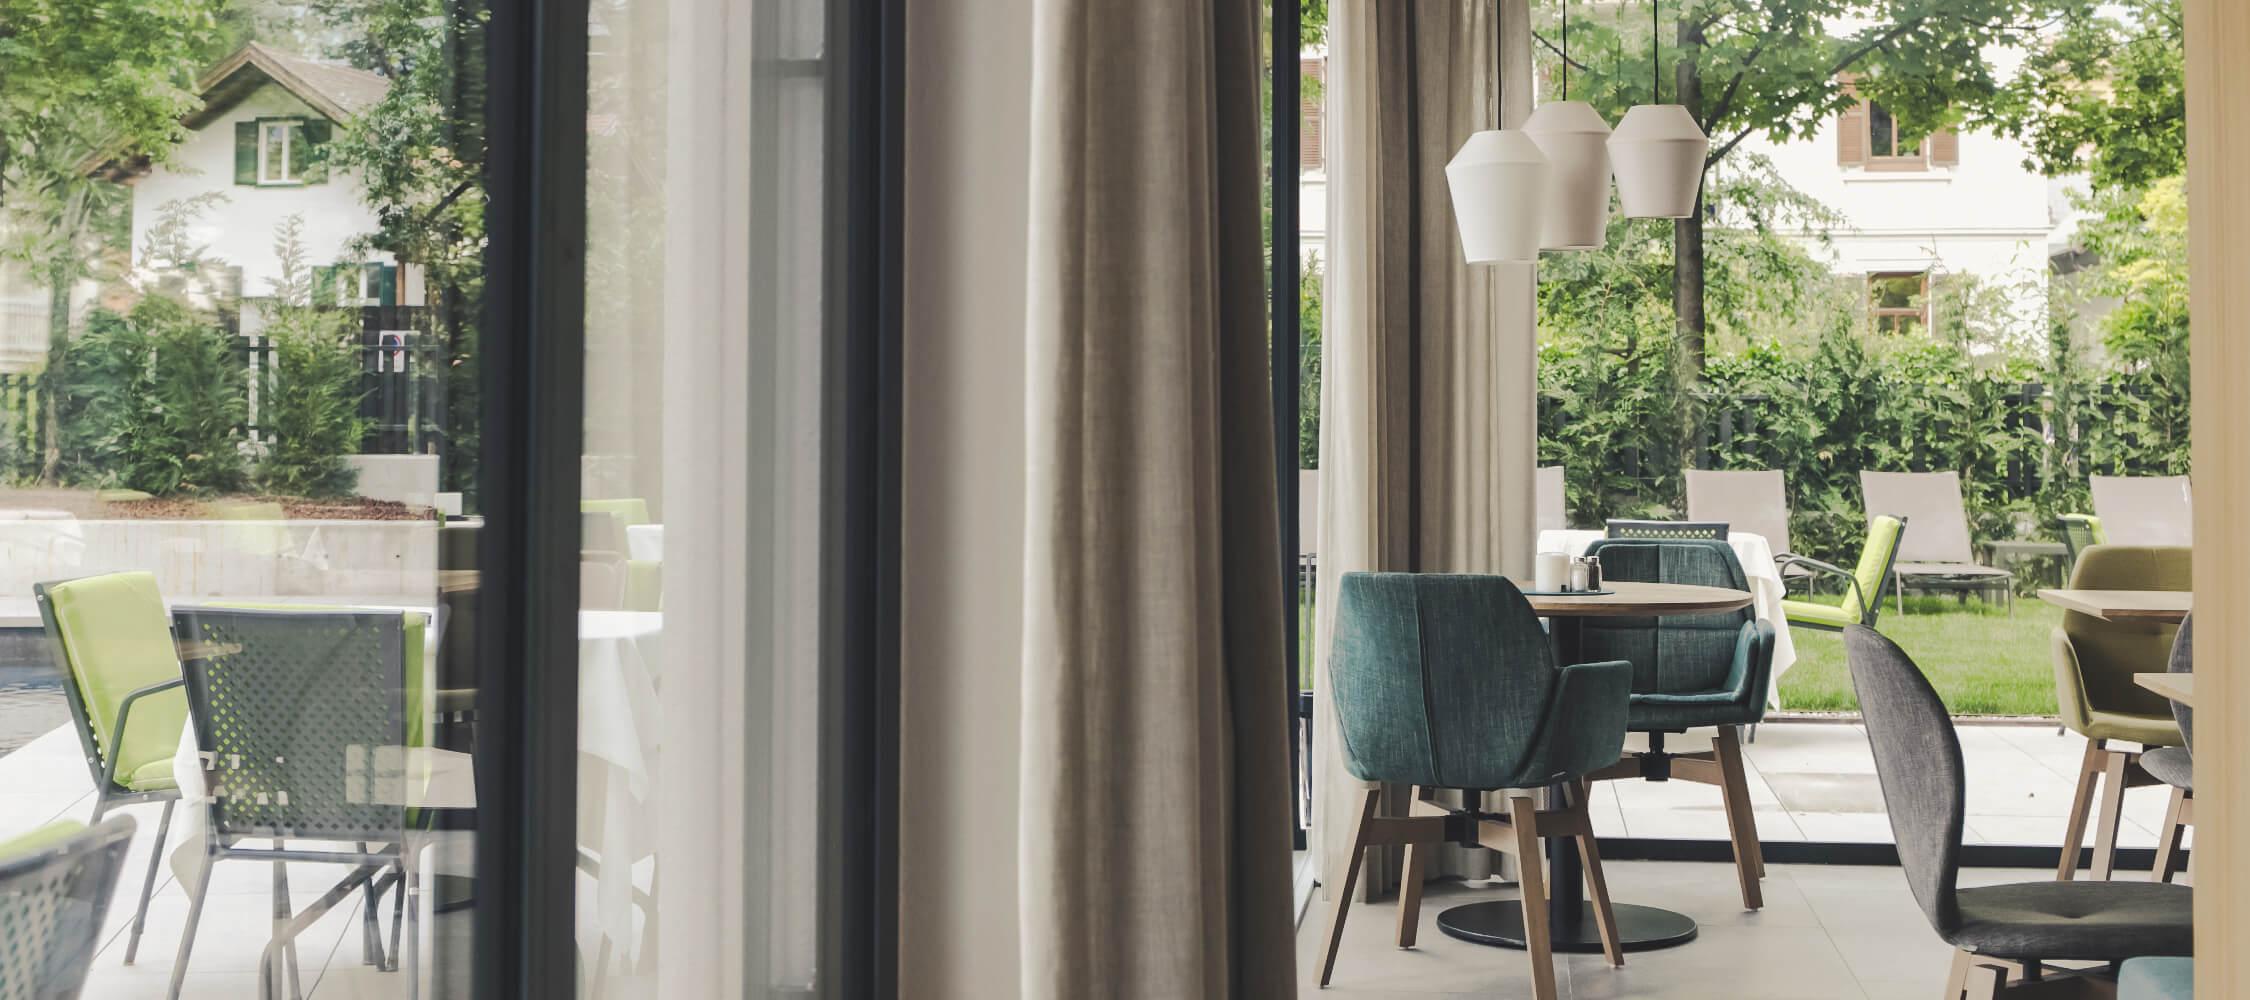 Hotel_Flora_Merano_Bar_Lobby_Detail_Anguane_2018-6423_2250x1000